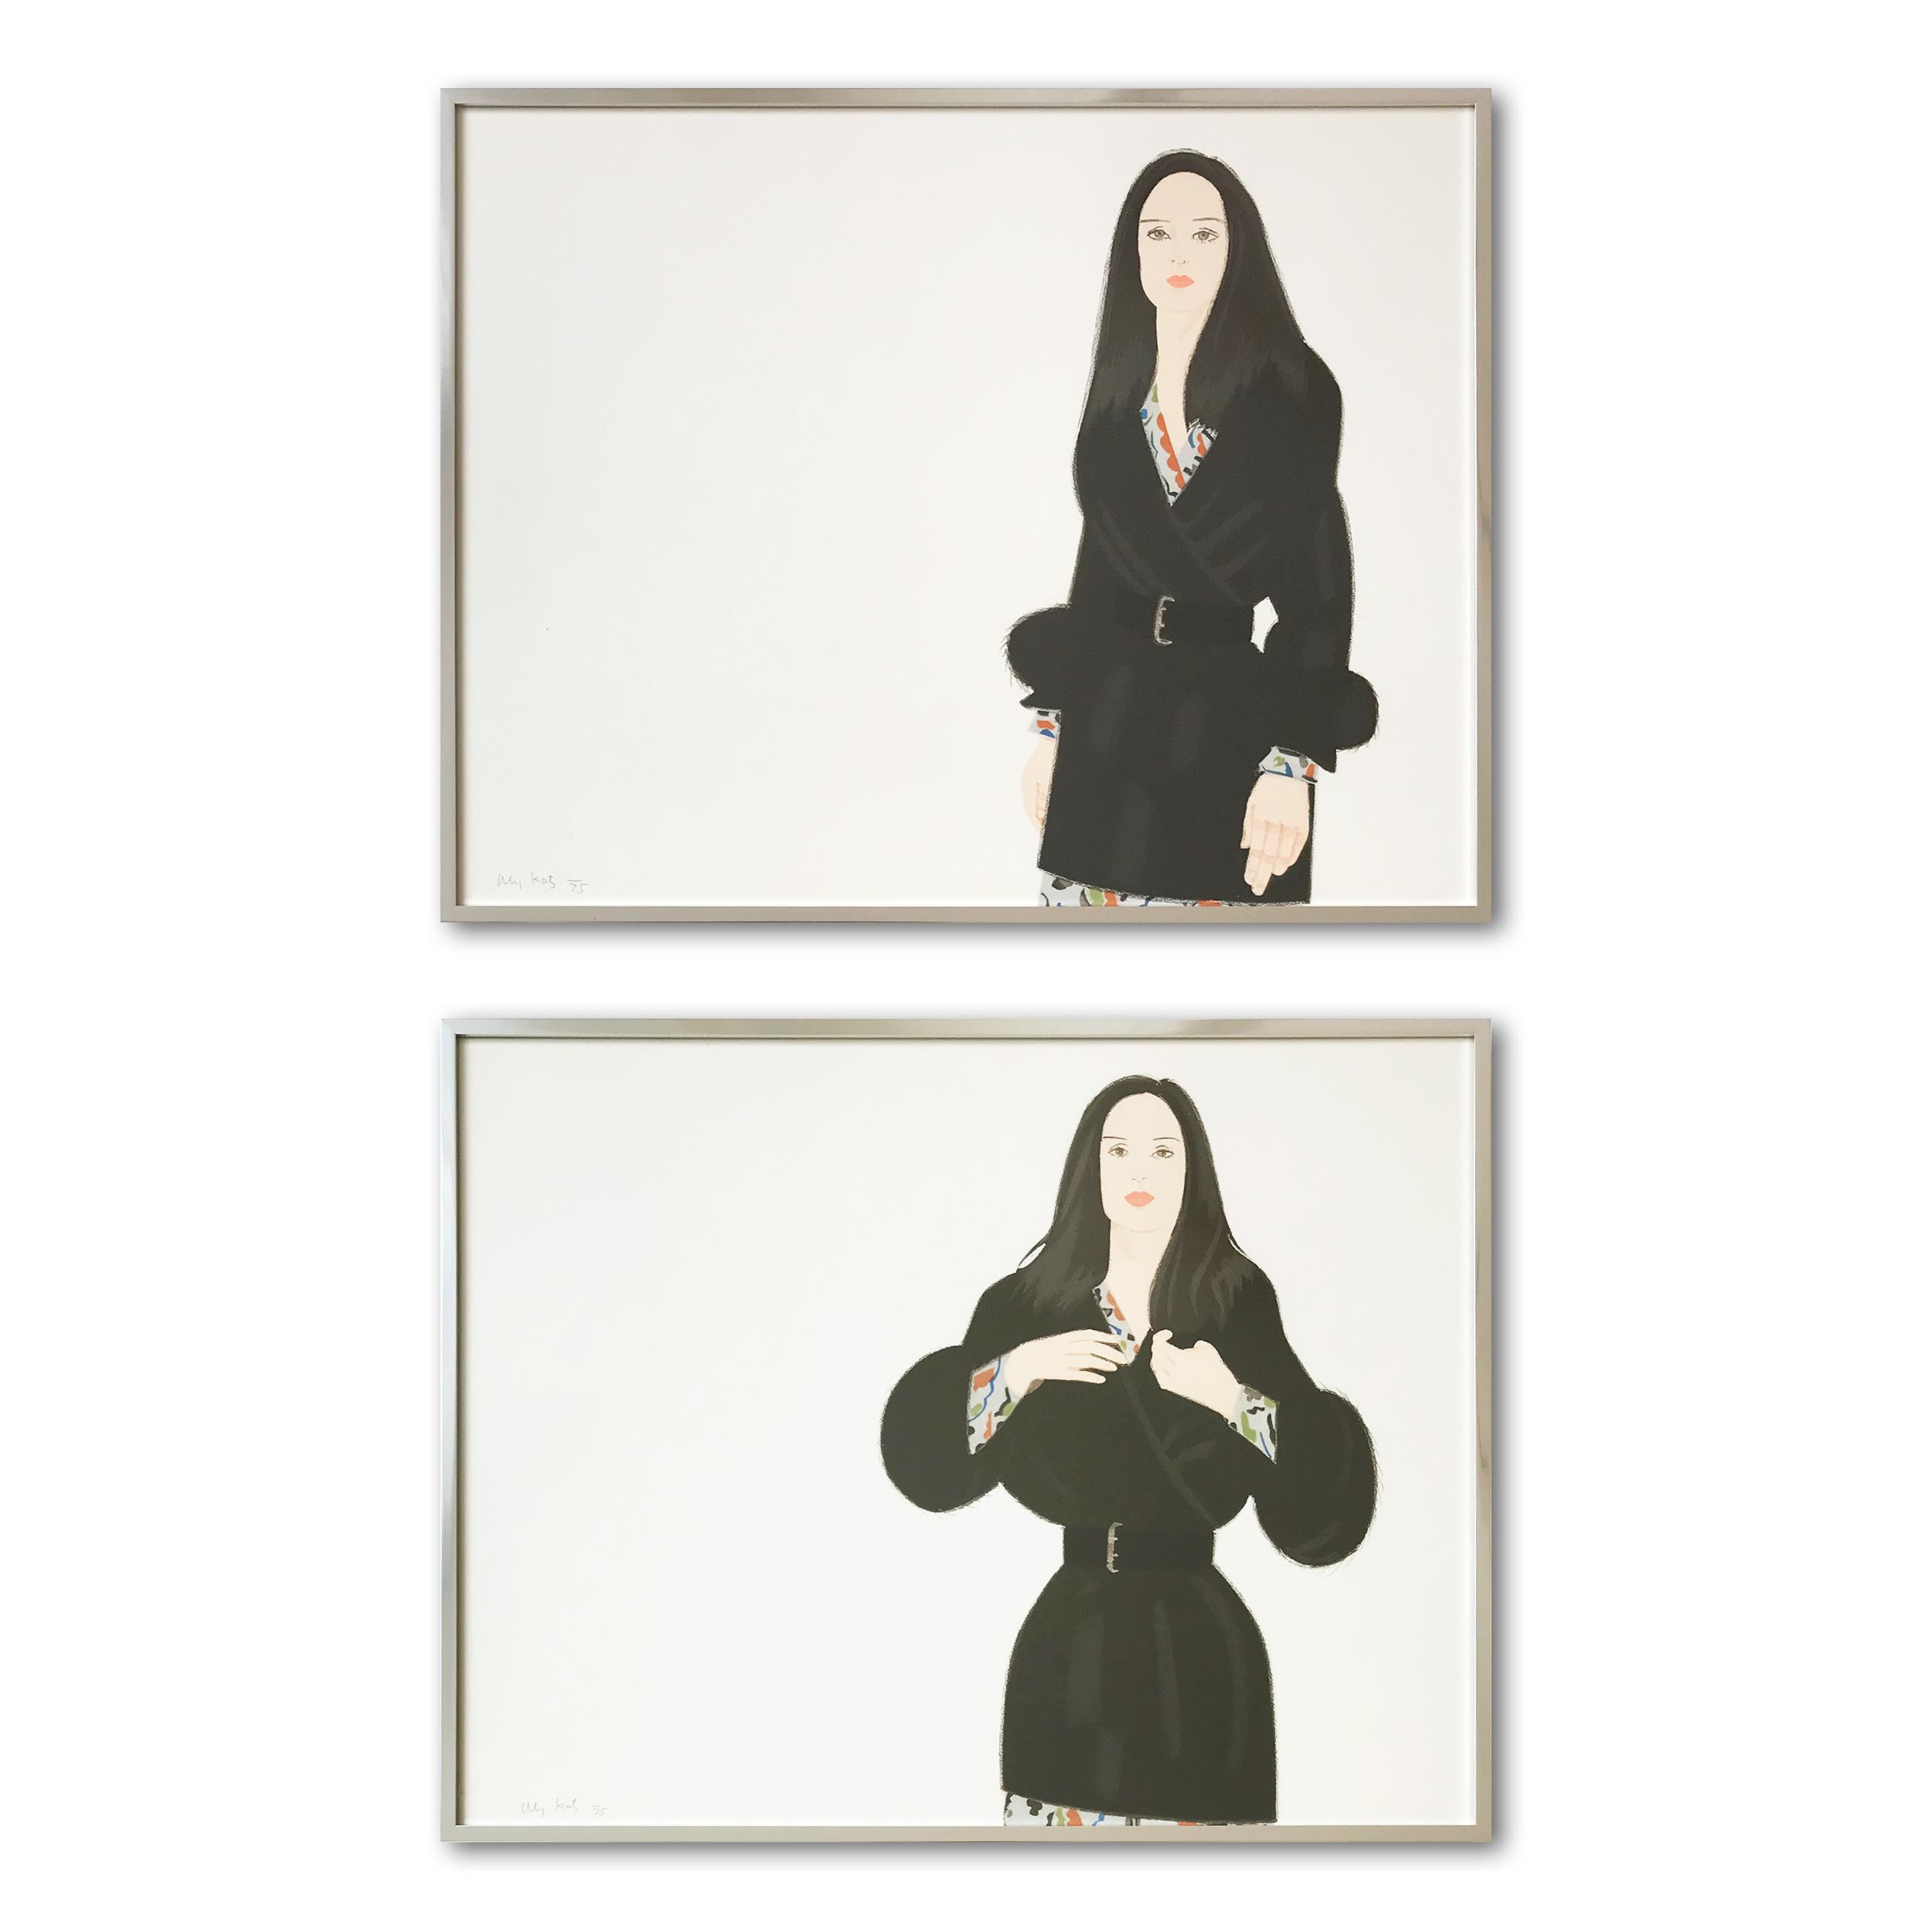 Maria I and II by Alex Katz